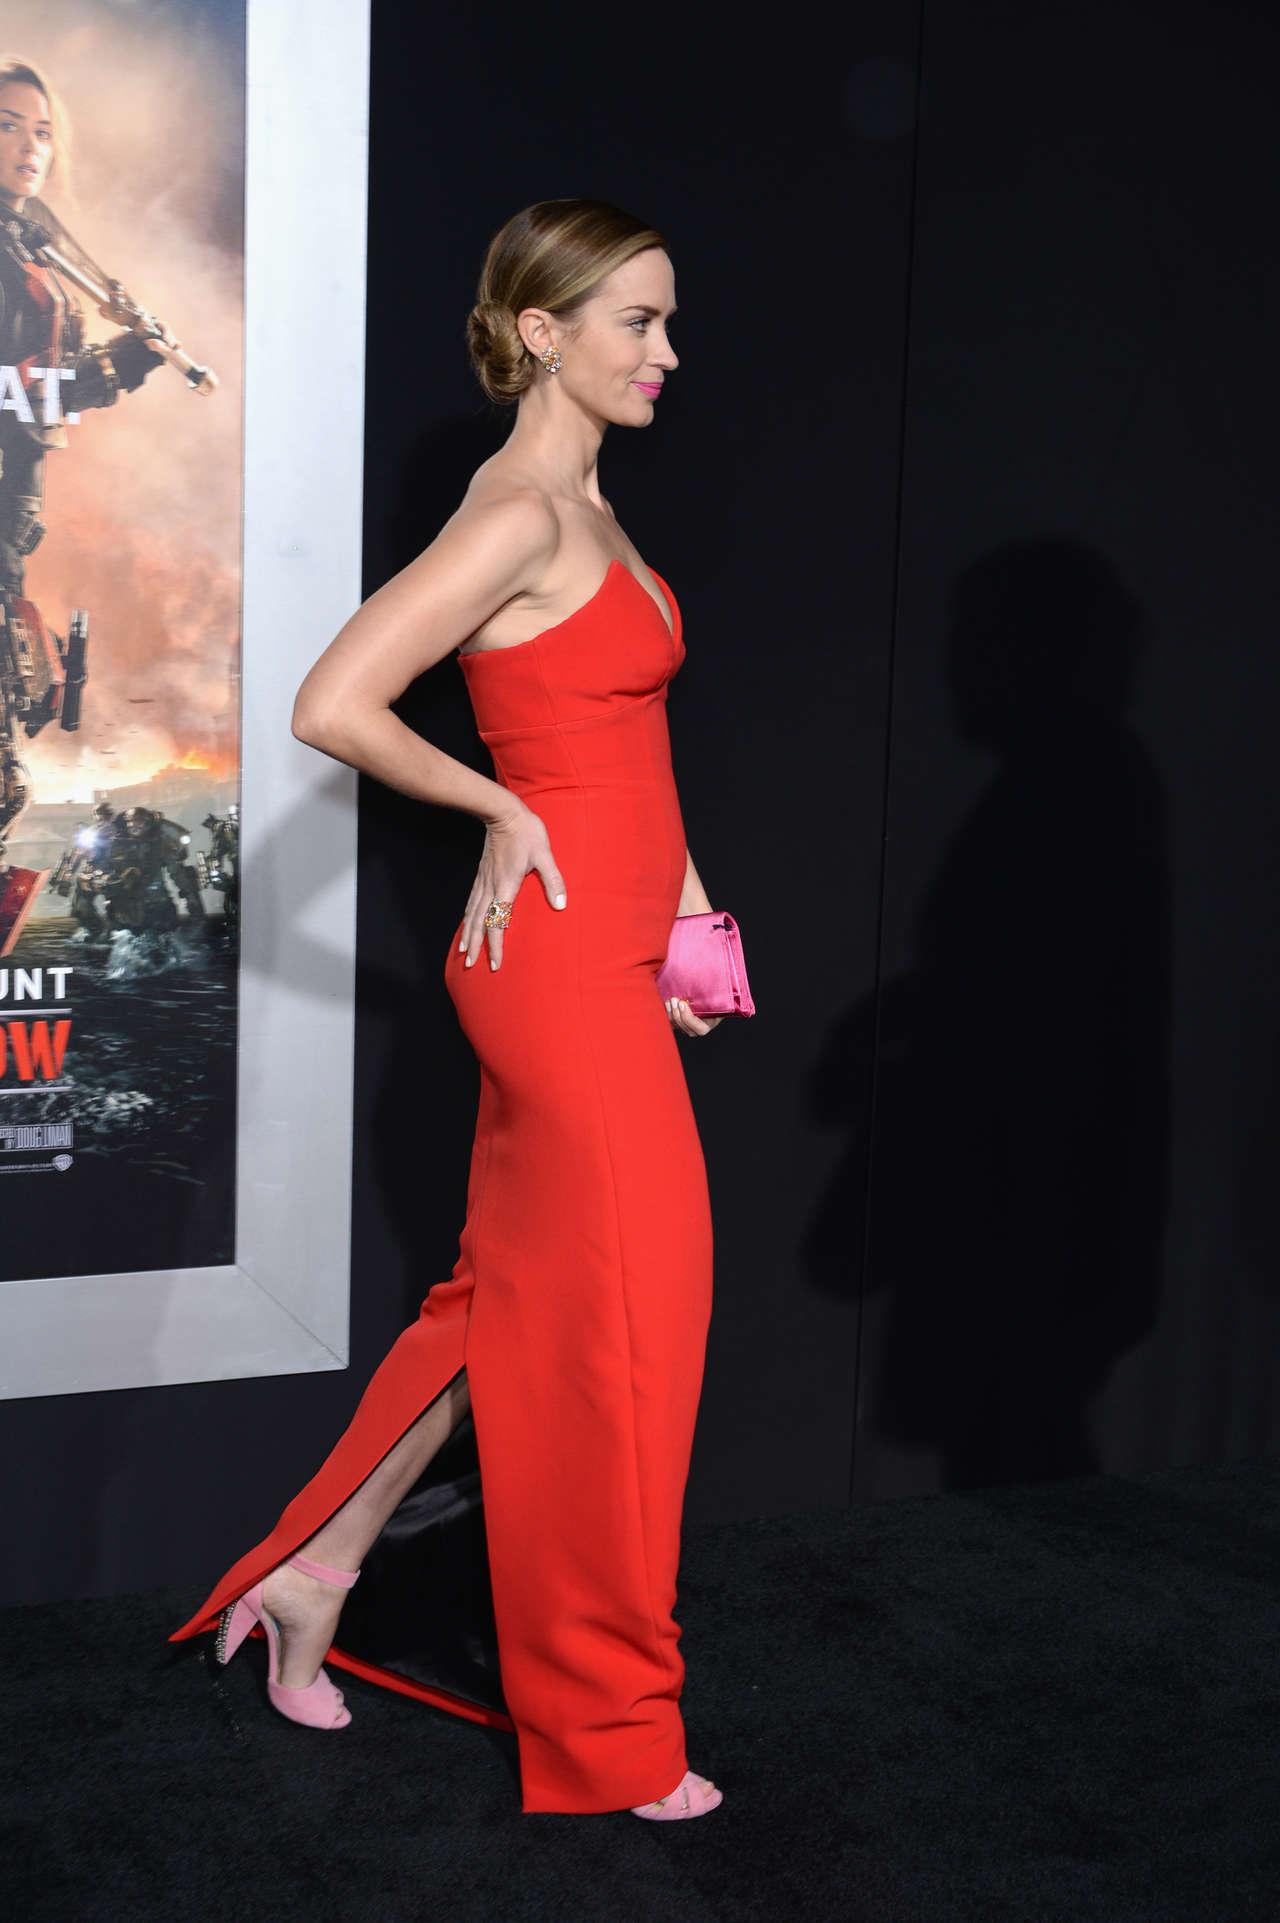 Emily Blunt Red Dress 21 Gotceleb